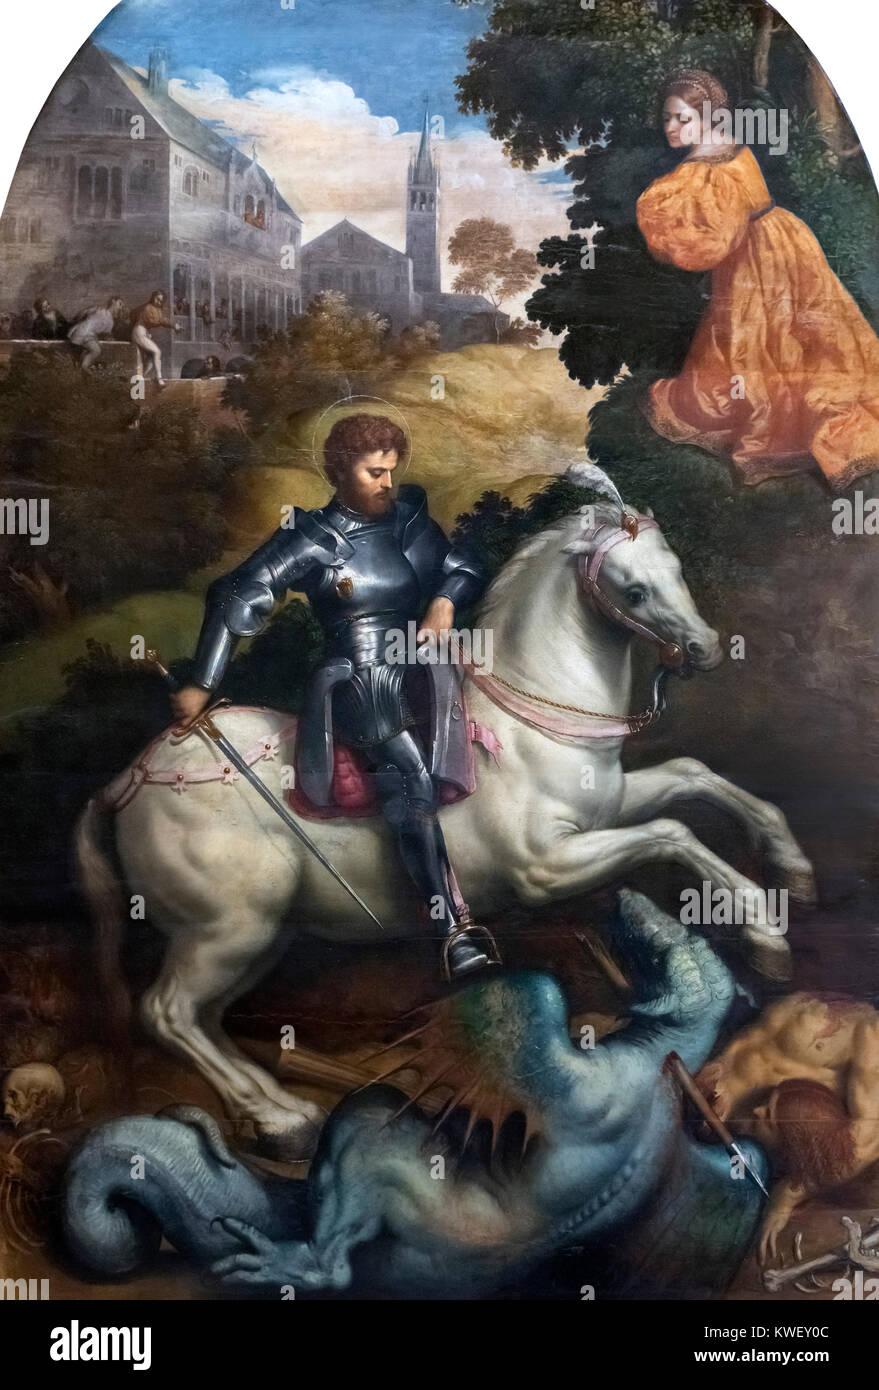 St George Killing the Dragon by Paris Bordon (1500-1571), oil on panel, c.1525 Stock Photo